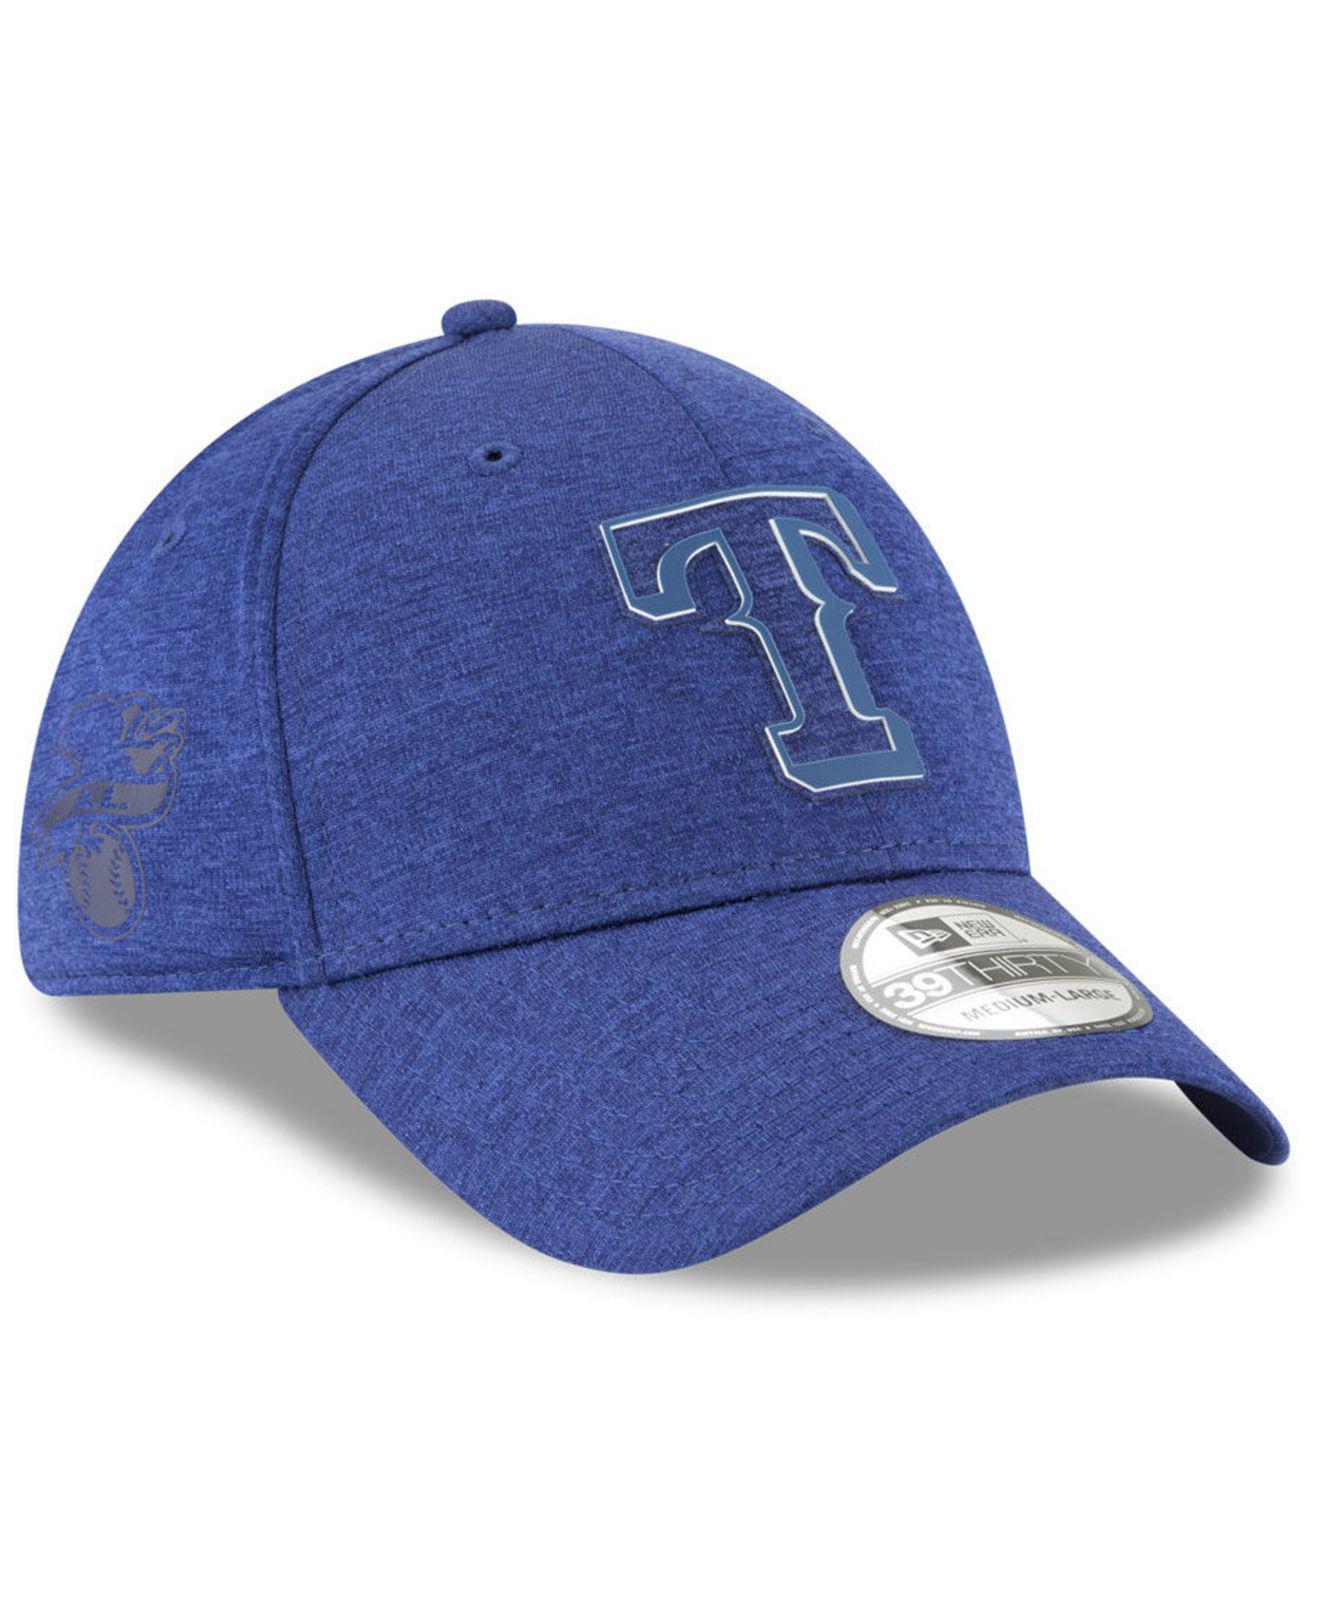 d4370da7f8b Lyst - Ktz Texas Rangers Clubhouse 39thirty Cap in Blue for Men